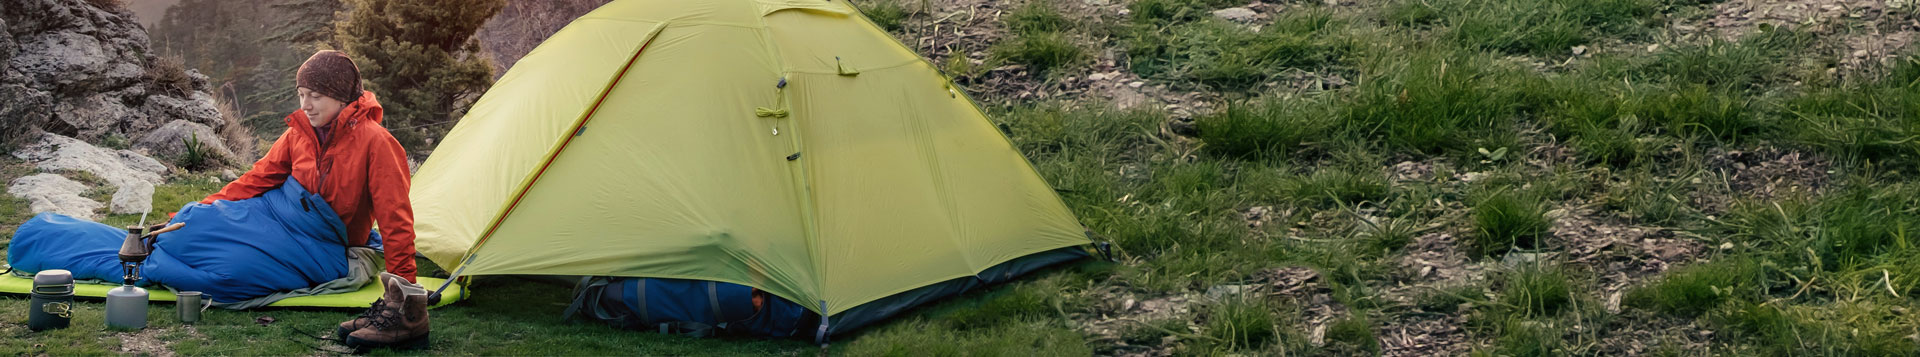 Sleeping Bags & Camping Mattresses Australia